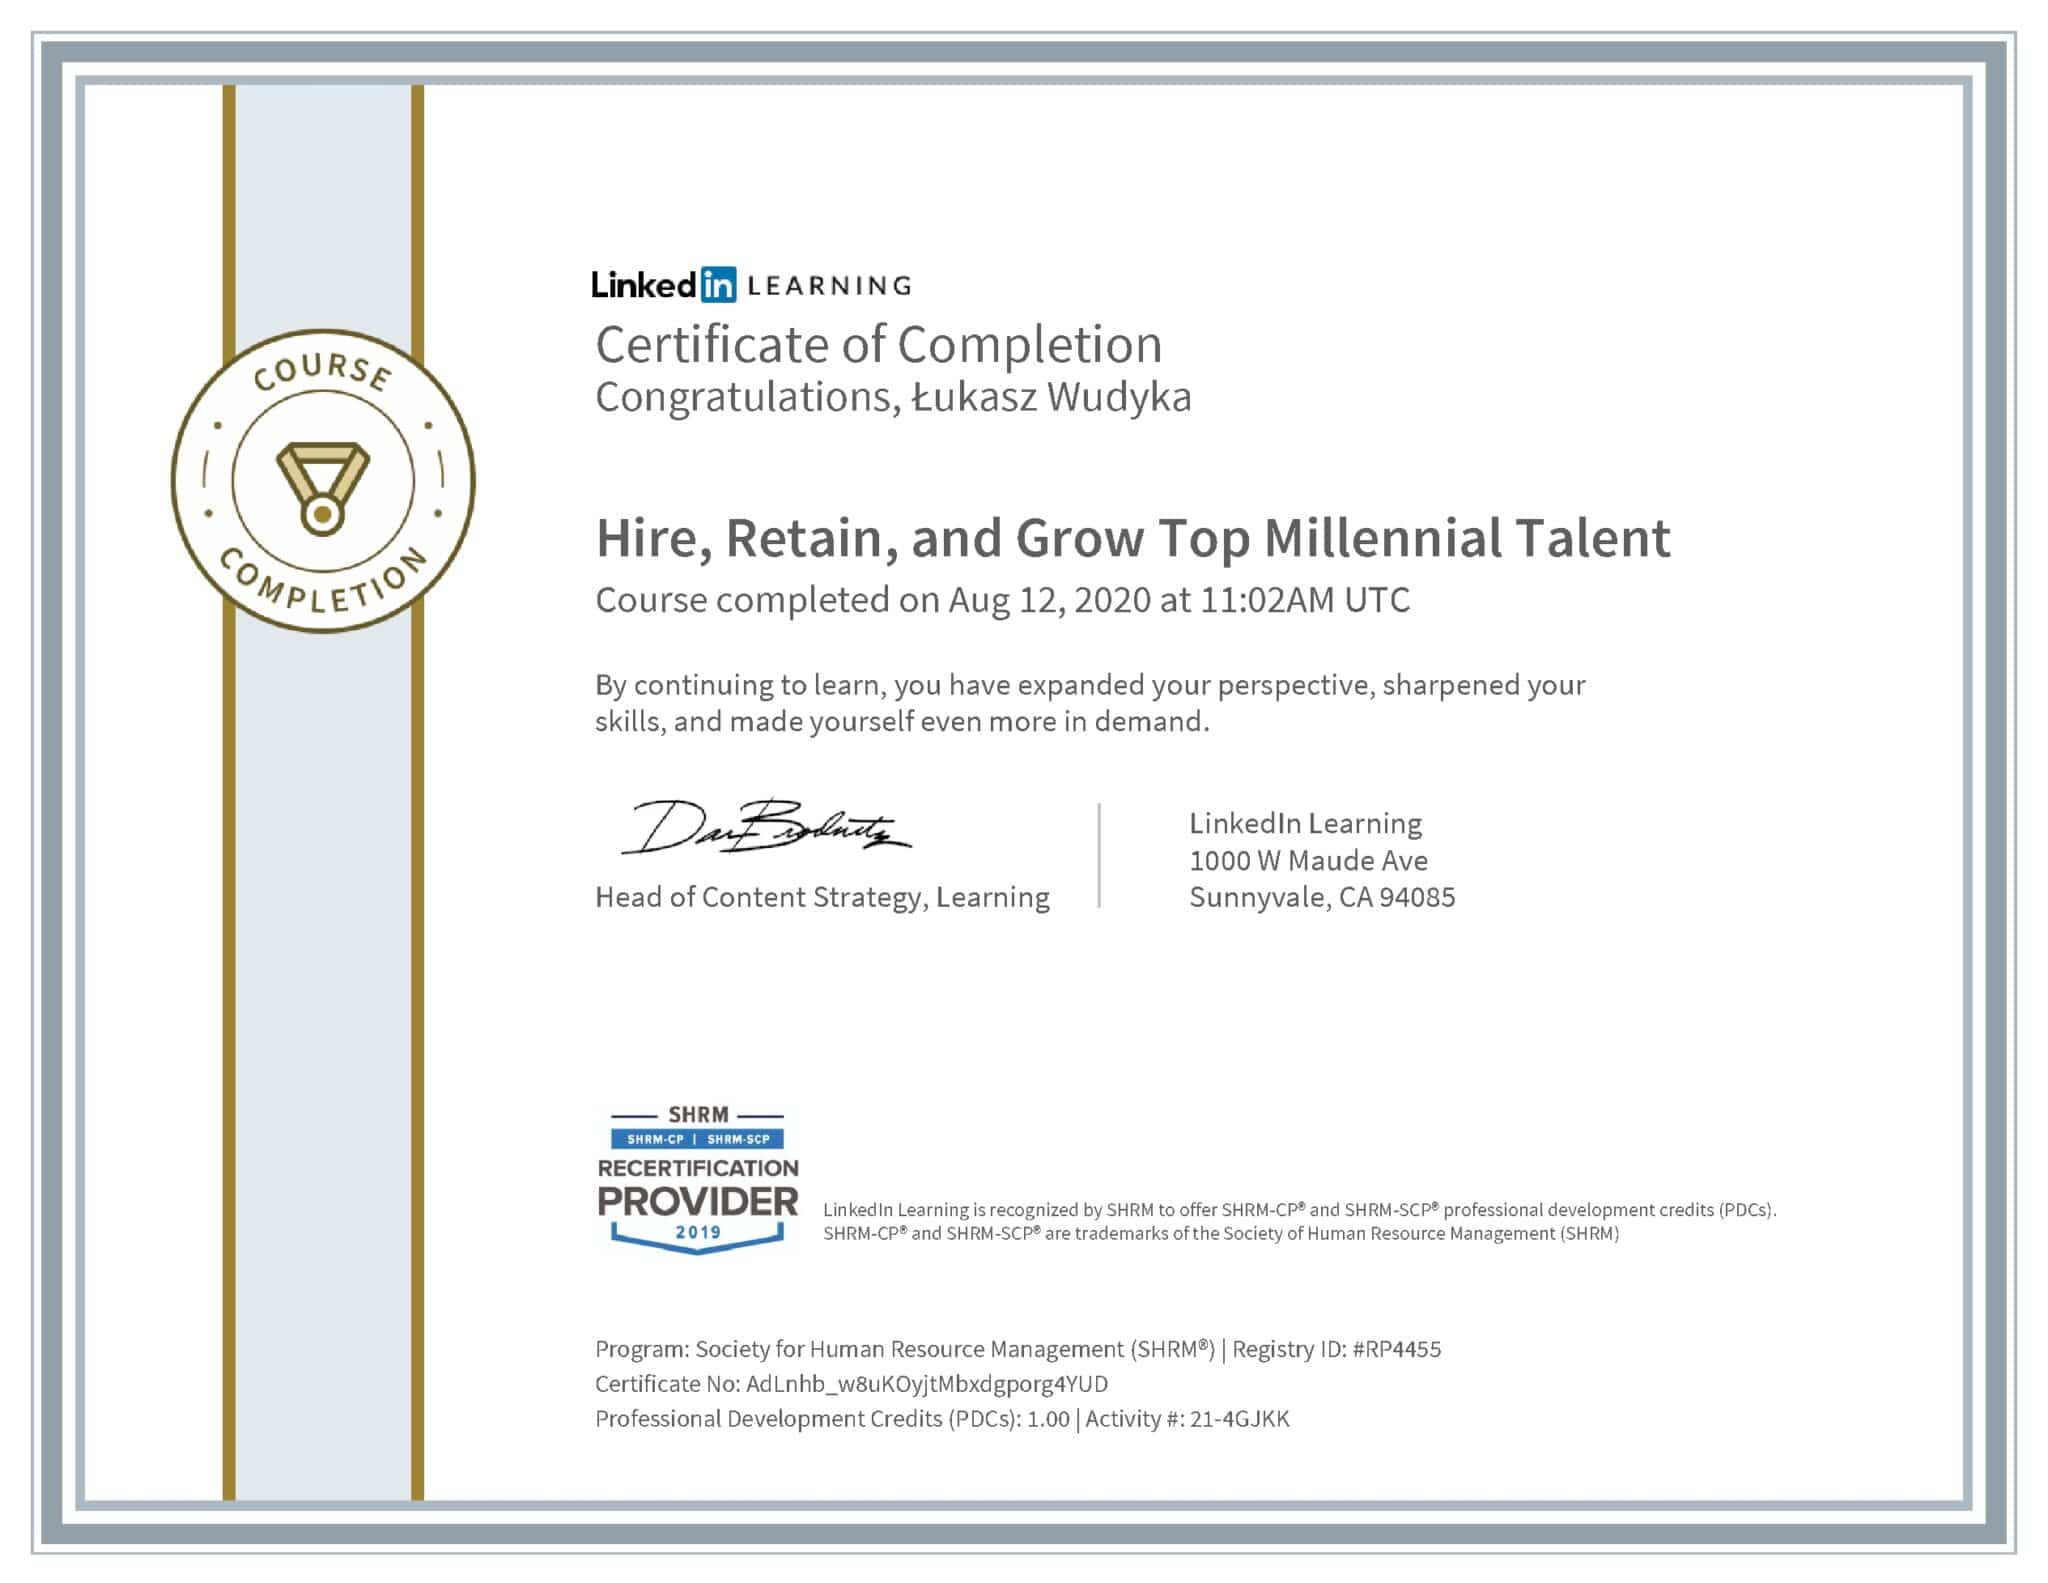 Łukasz Wudyka certyfikat LinkedIn Hire, Retain, and Grow Top Millennial Talent SHRM